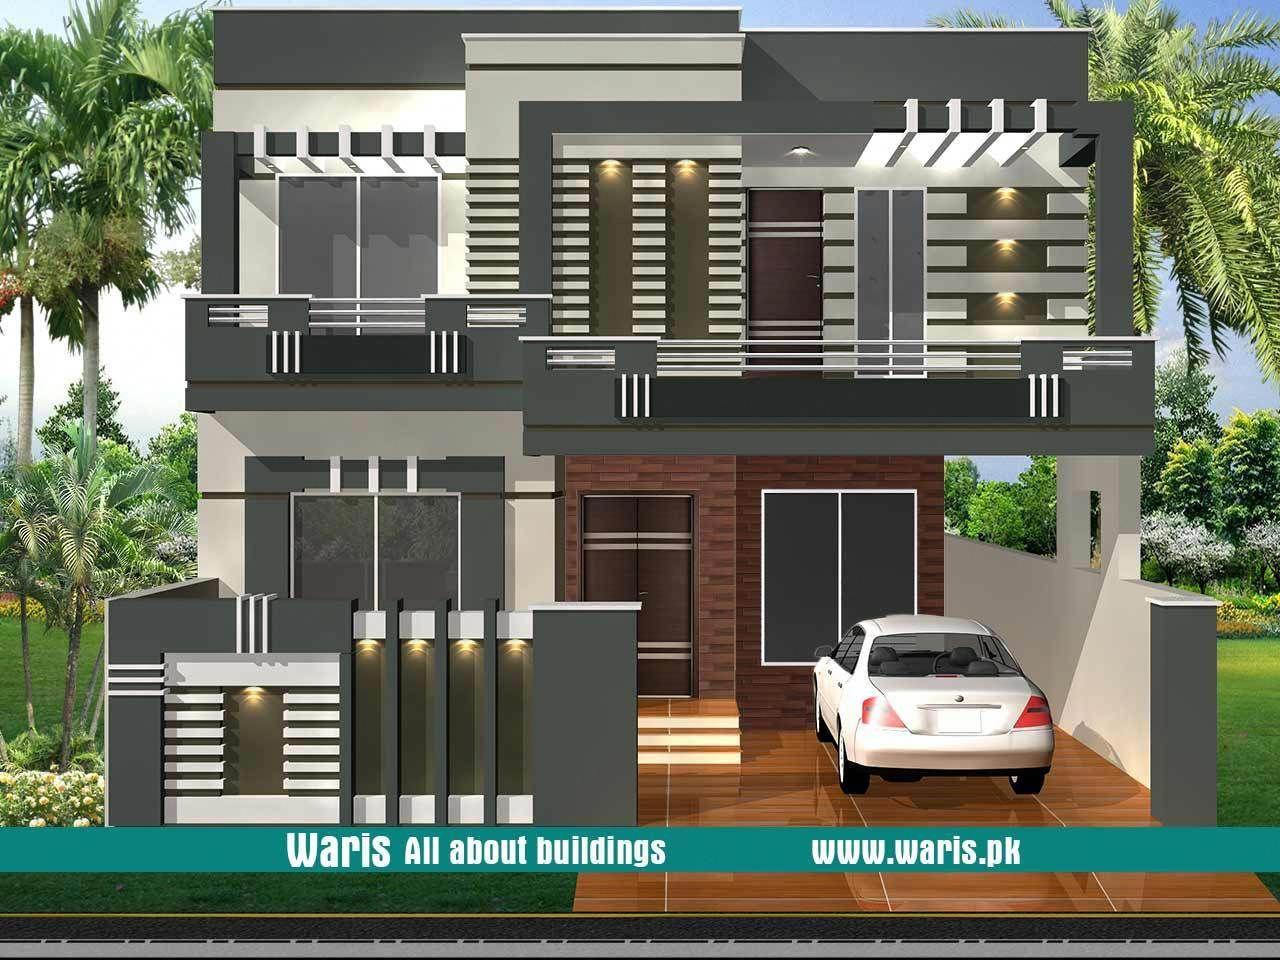 Discover ideas about front elevation designs also interior yardage lexington kentucky modelxinterior fantasy house rh pinterest